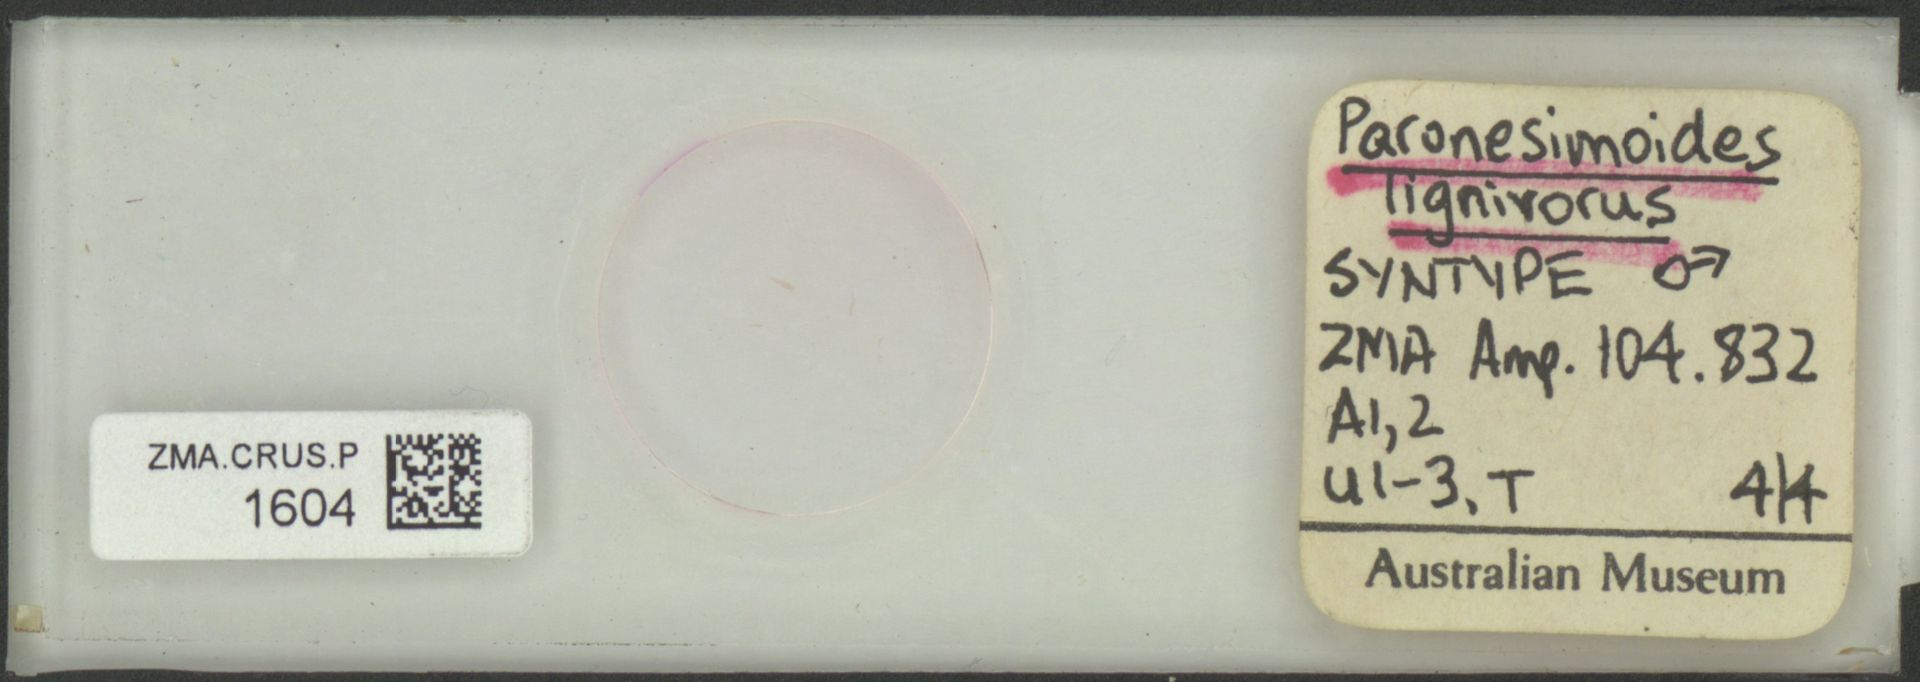 ZMA.CRUS.P.1604 | Paronesimoides lignivorus